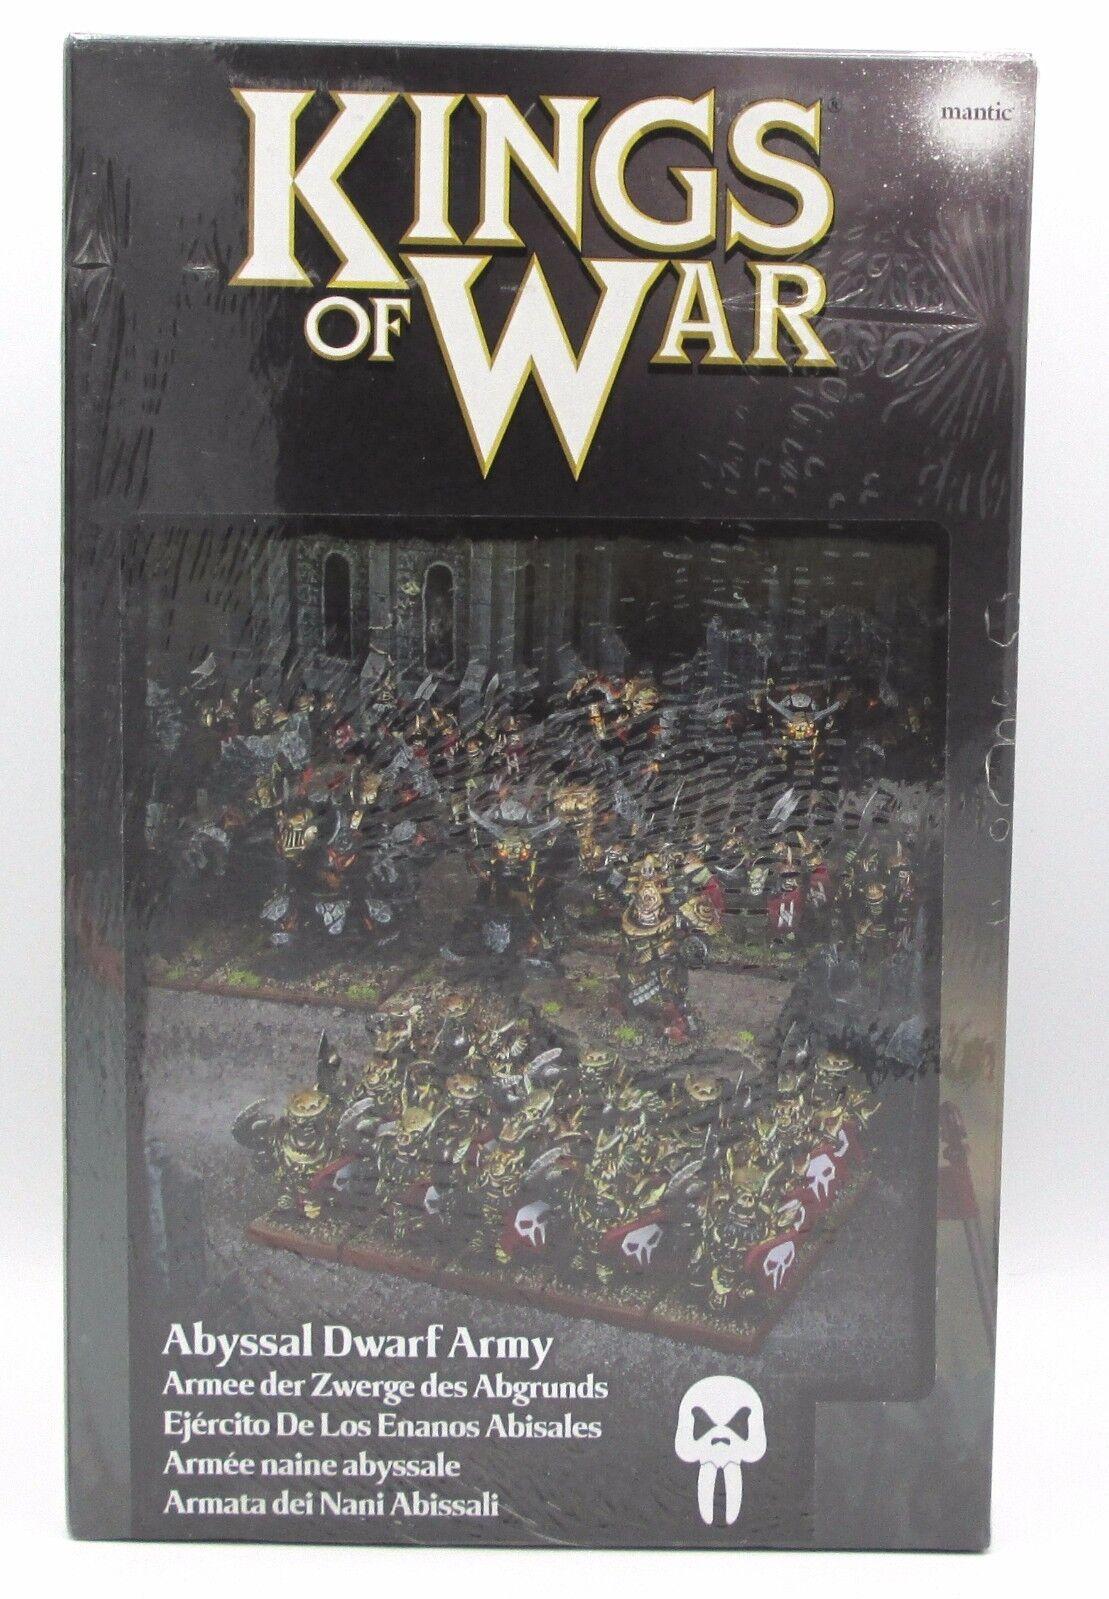 Kings of War MGKWK110 Abyssal Dwarf Army (Abyssal Dwarfs) Evil Chaos Dwarves NIB